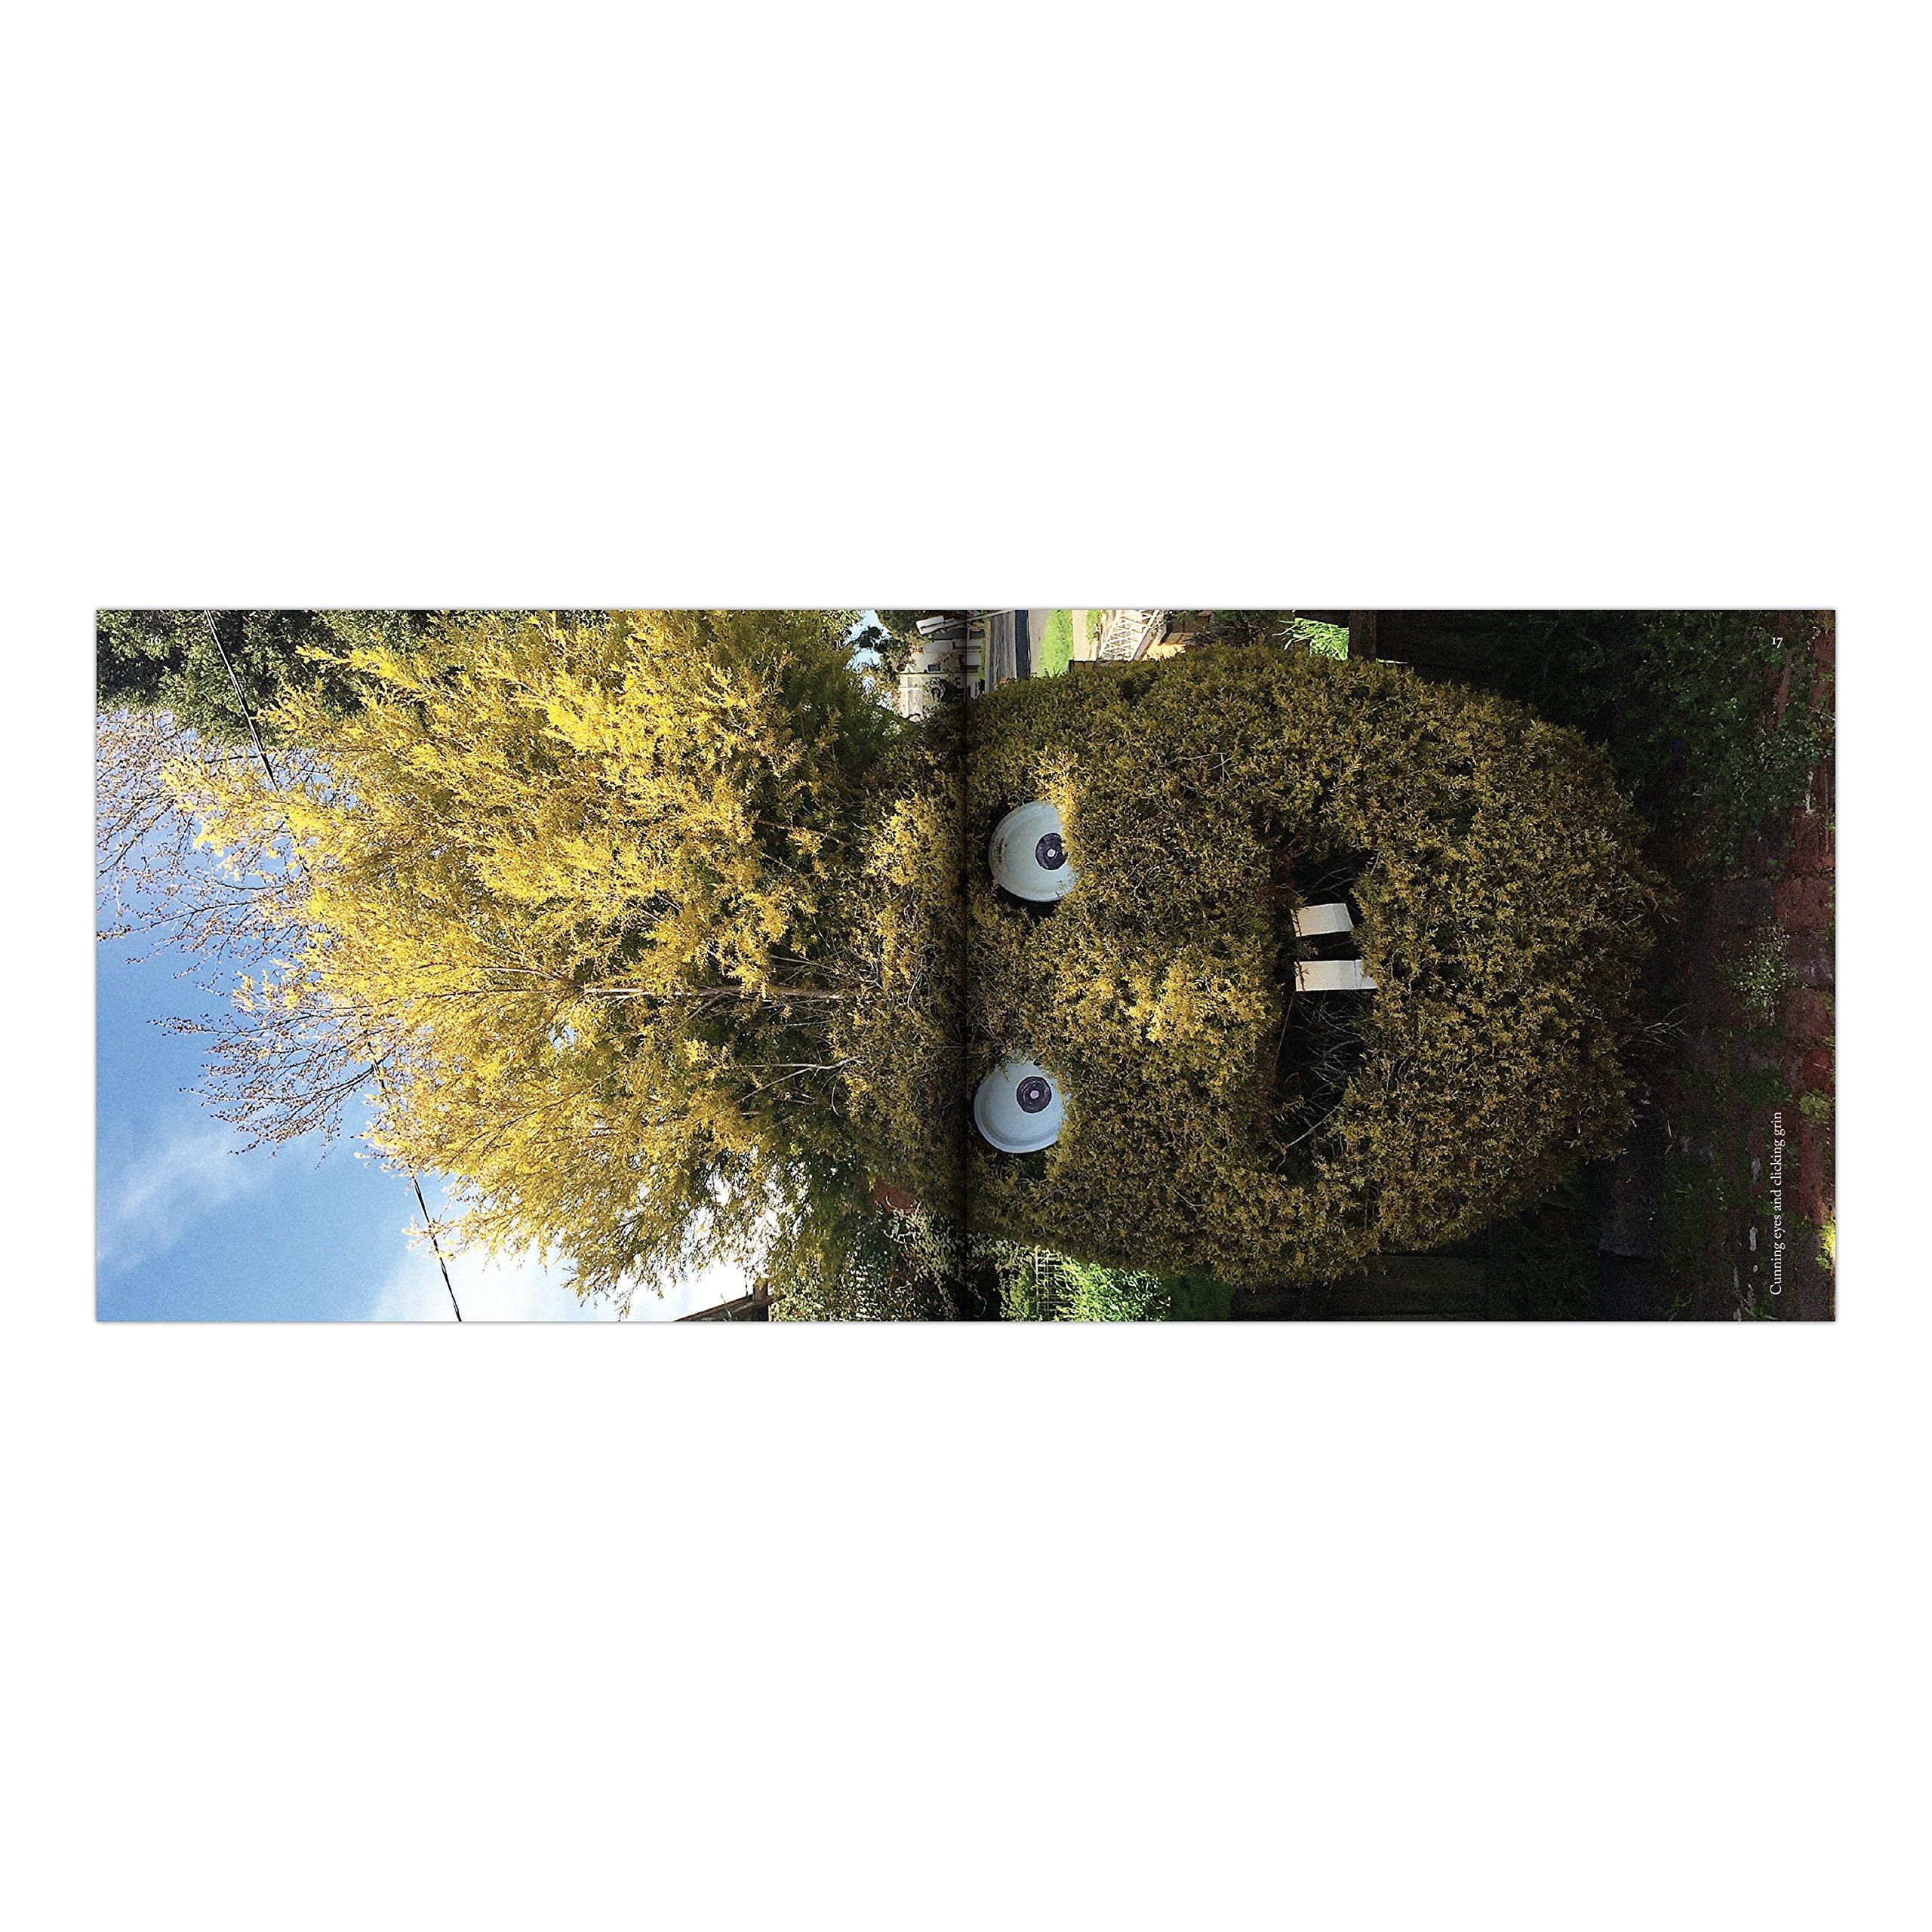 Sh*t Gardens: James Hull, Bede Brennan: 9781683490548: Amazon.com: Books